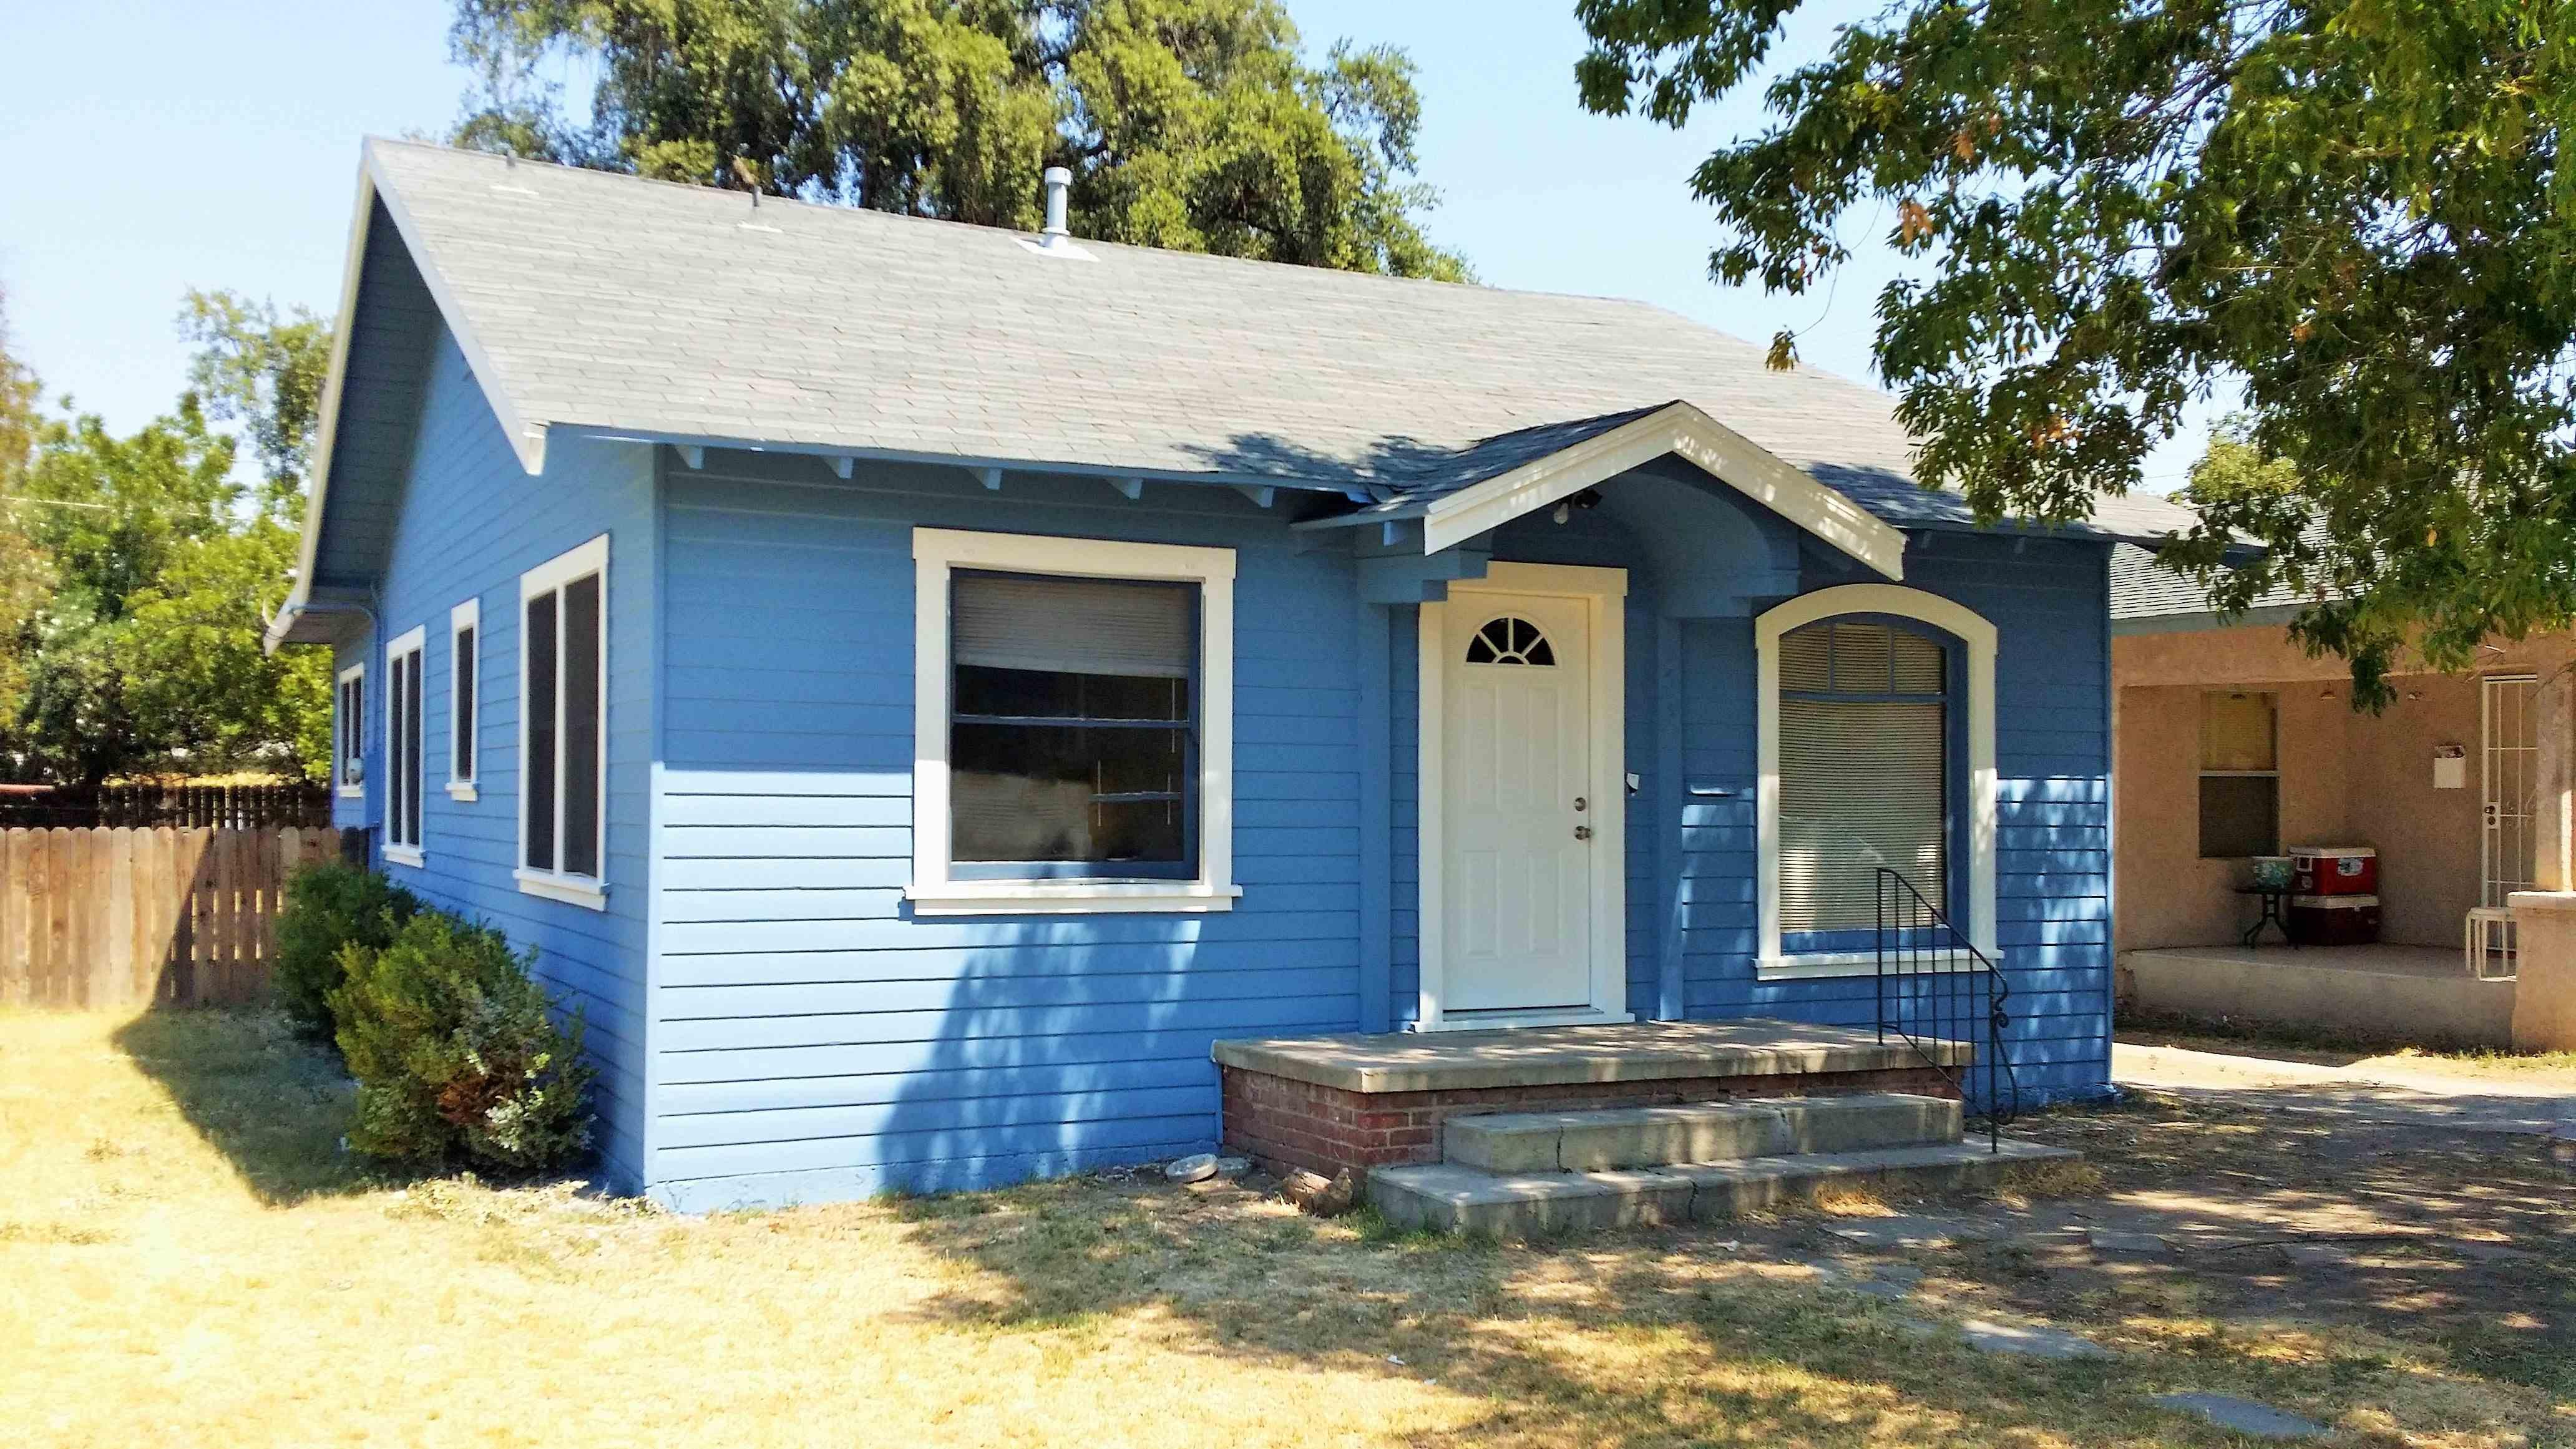 1405 N Green St, Hanford, CA 93230